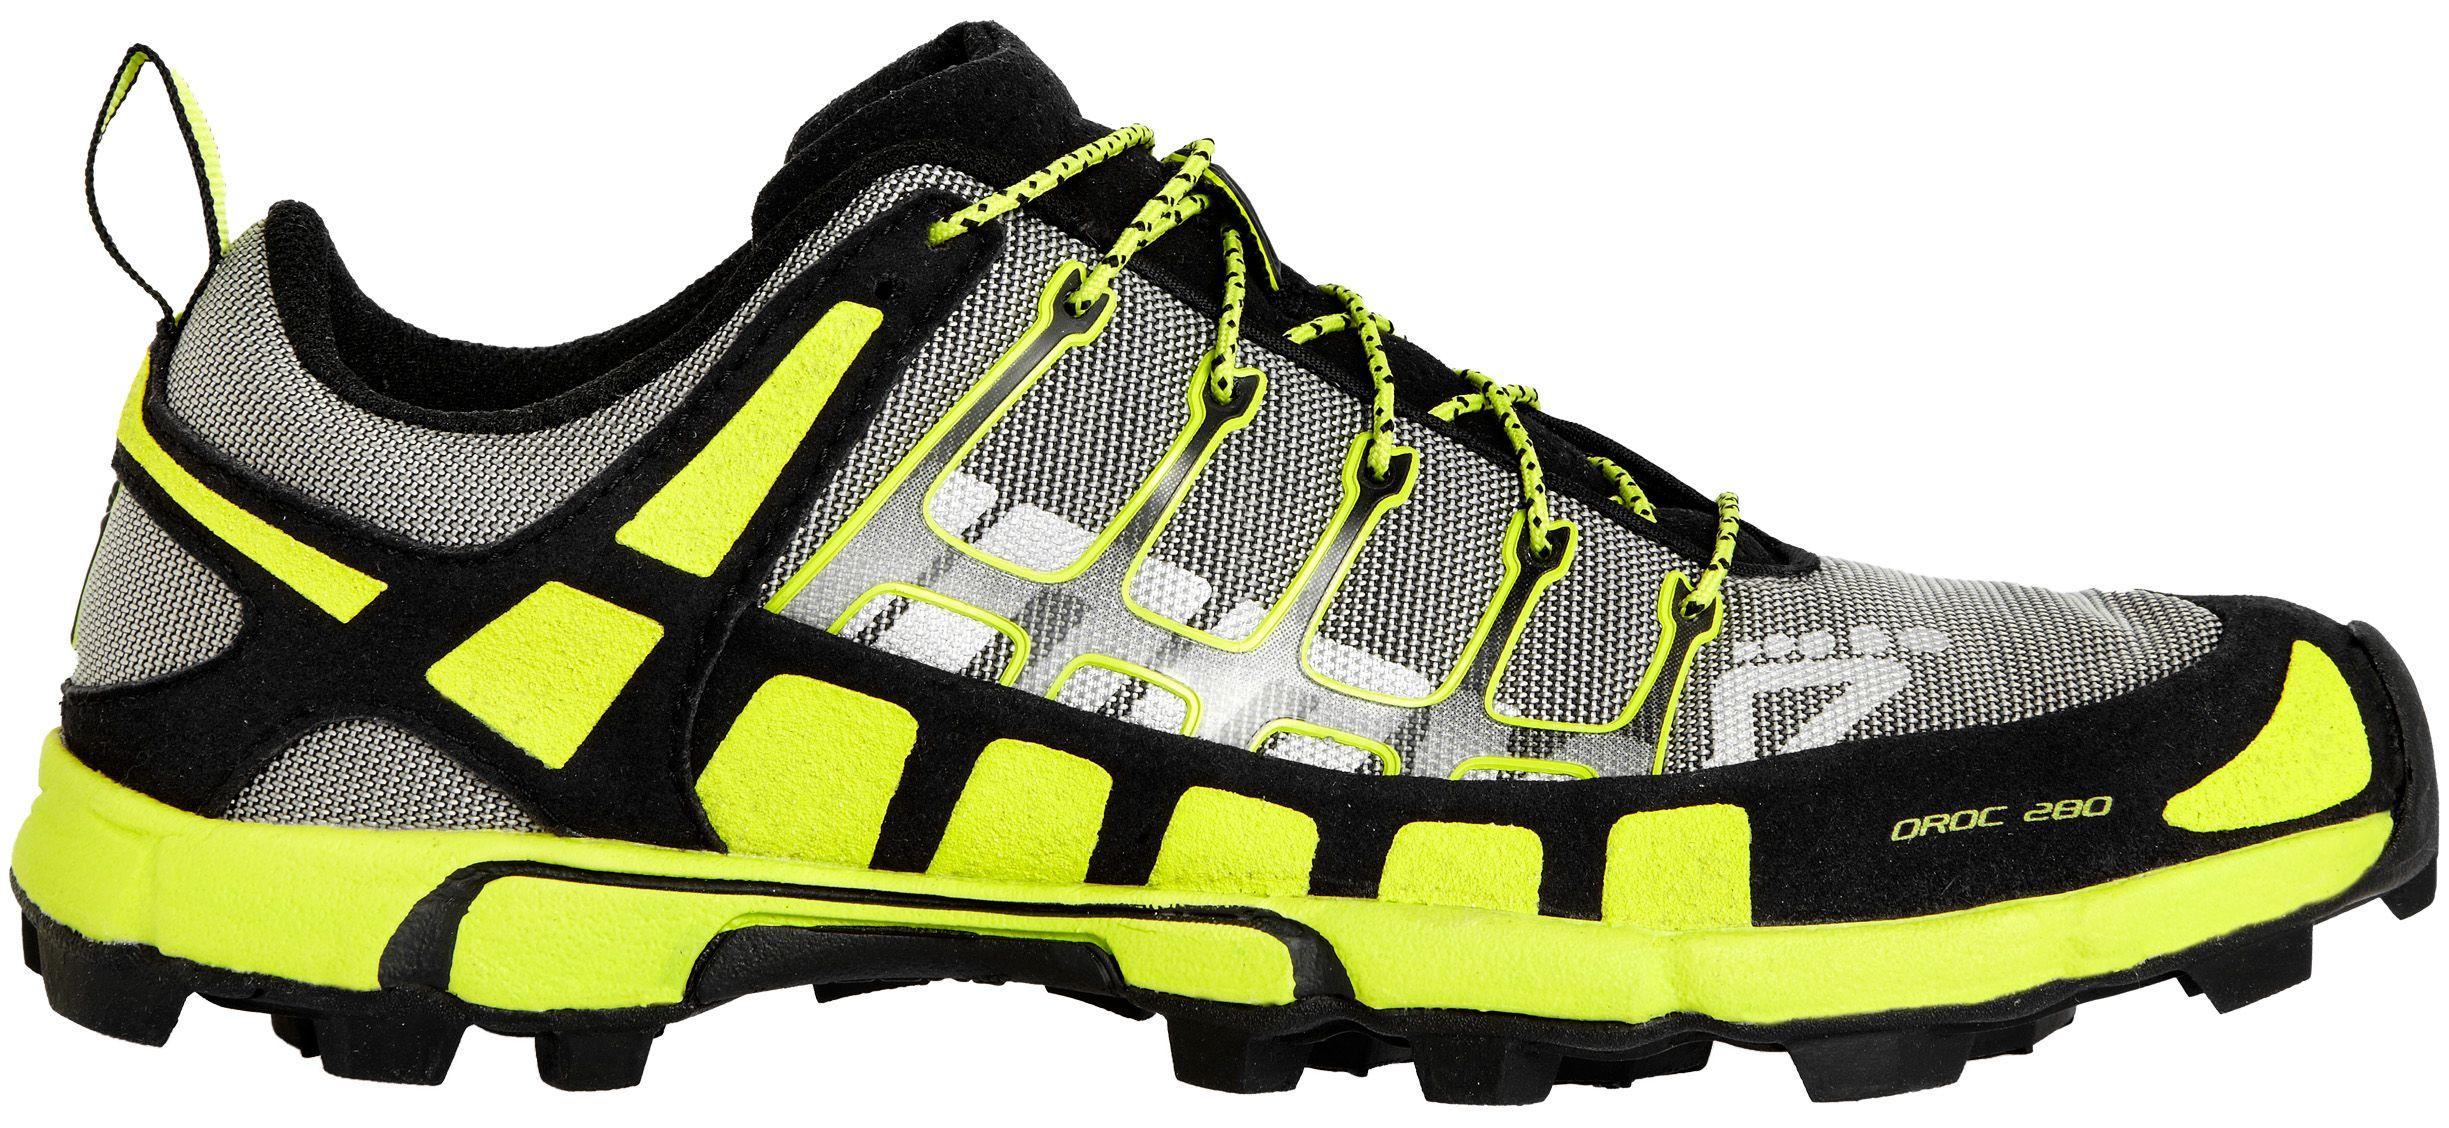 Inov 8 Footwear Oroc 280 Hiking Boots Boots Footwear